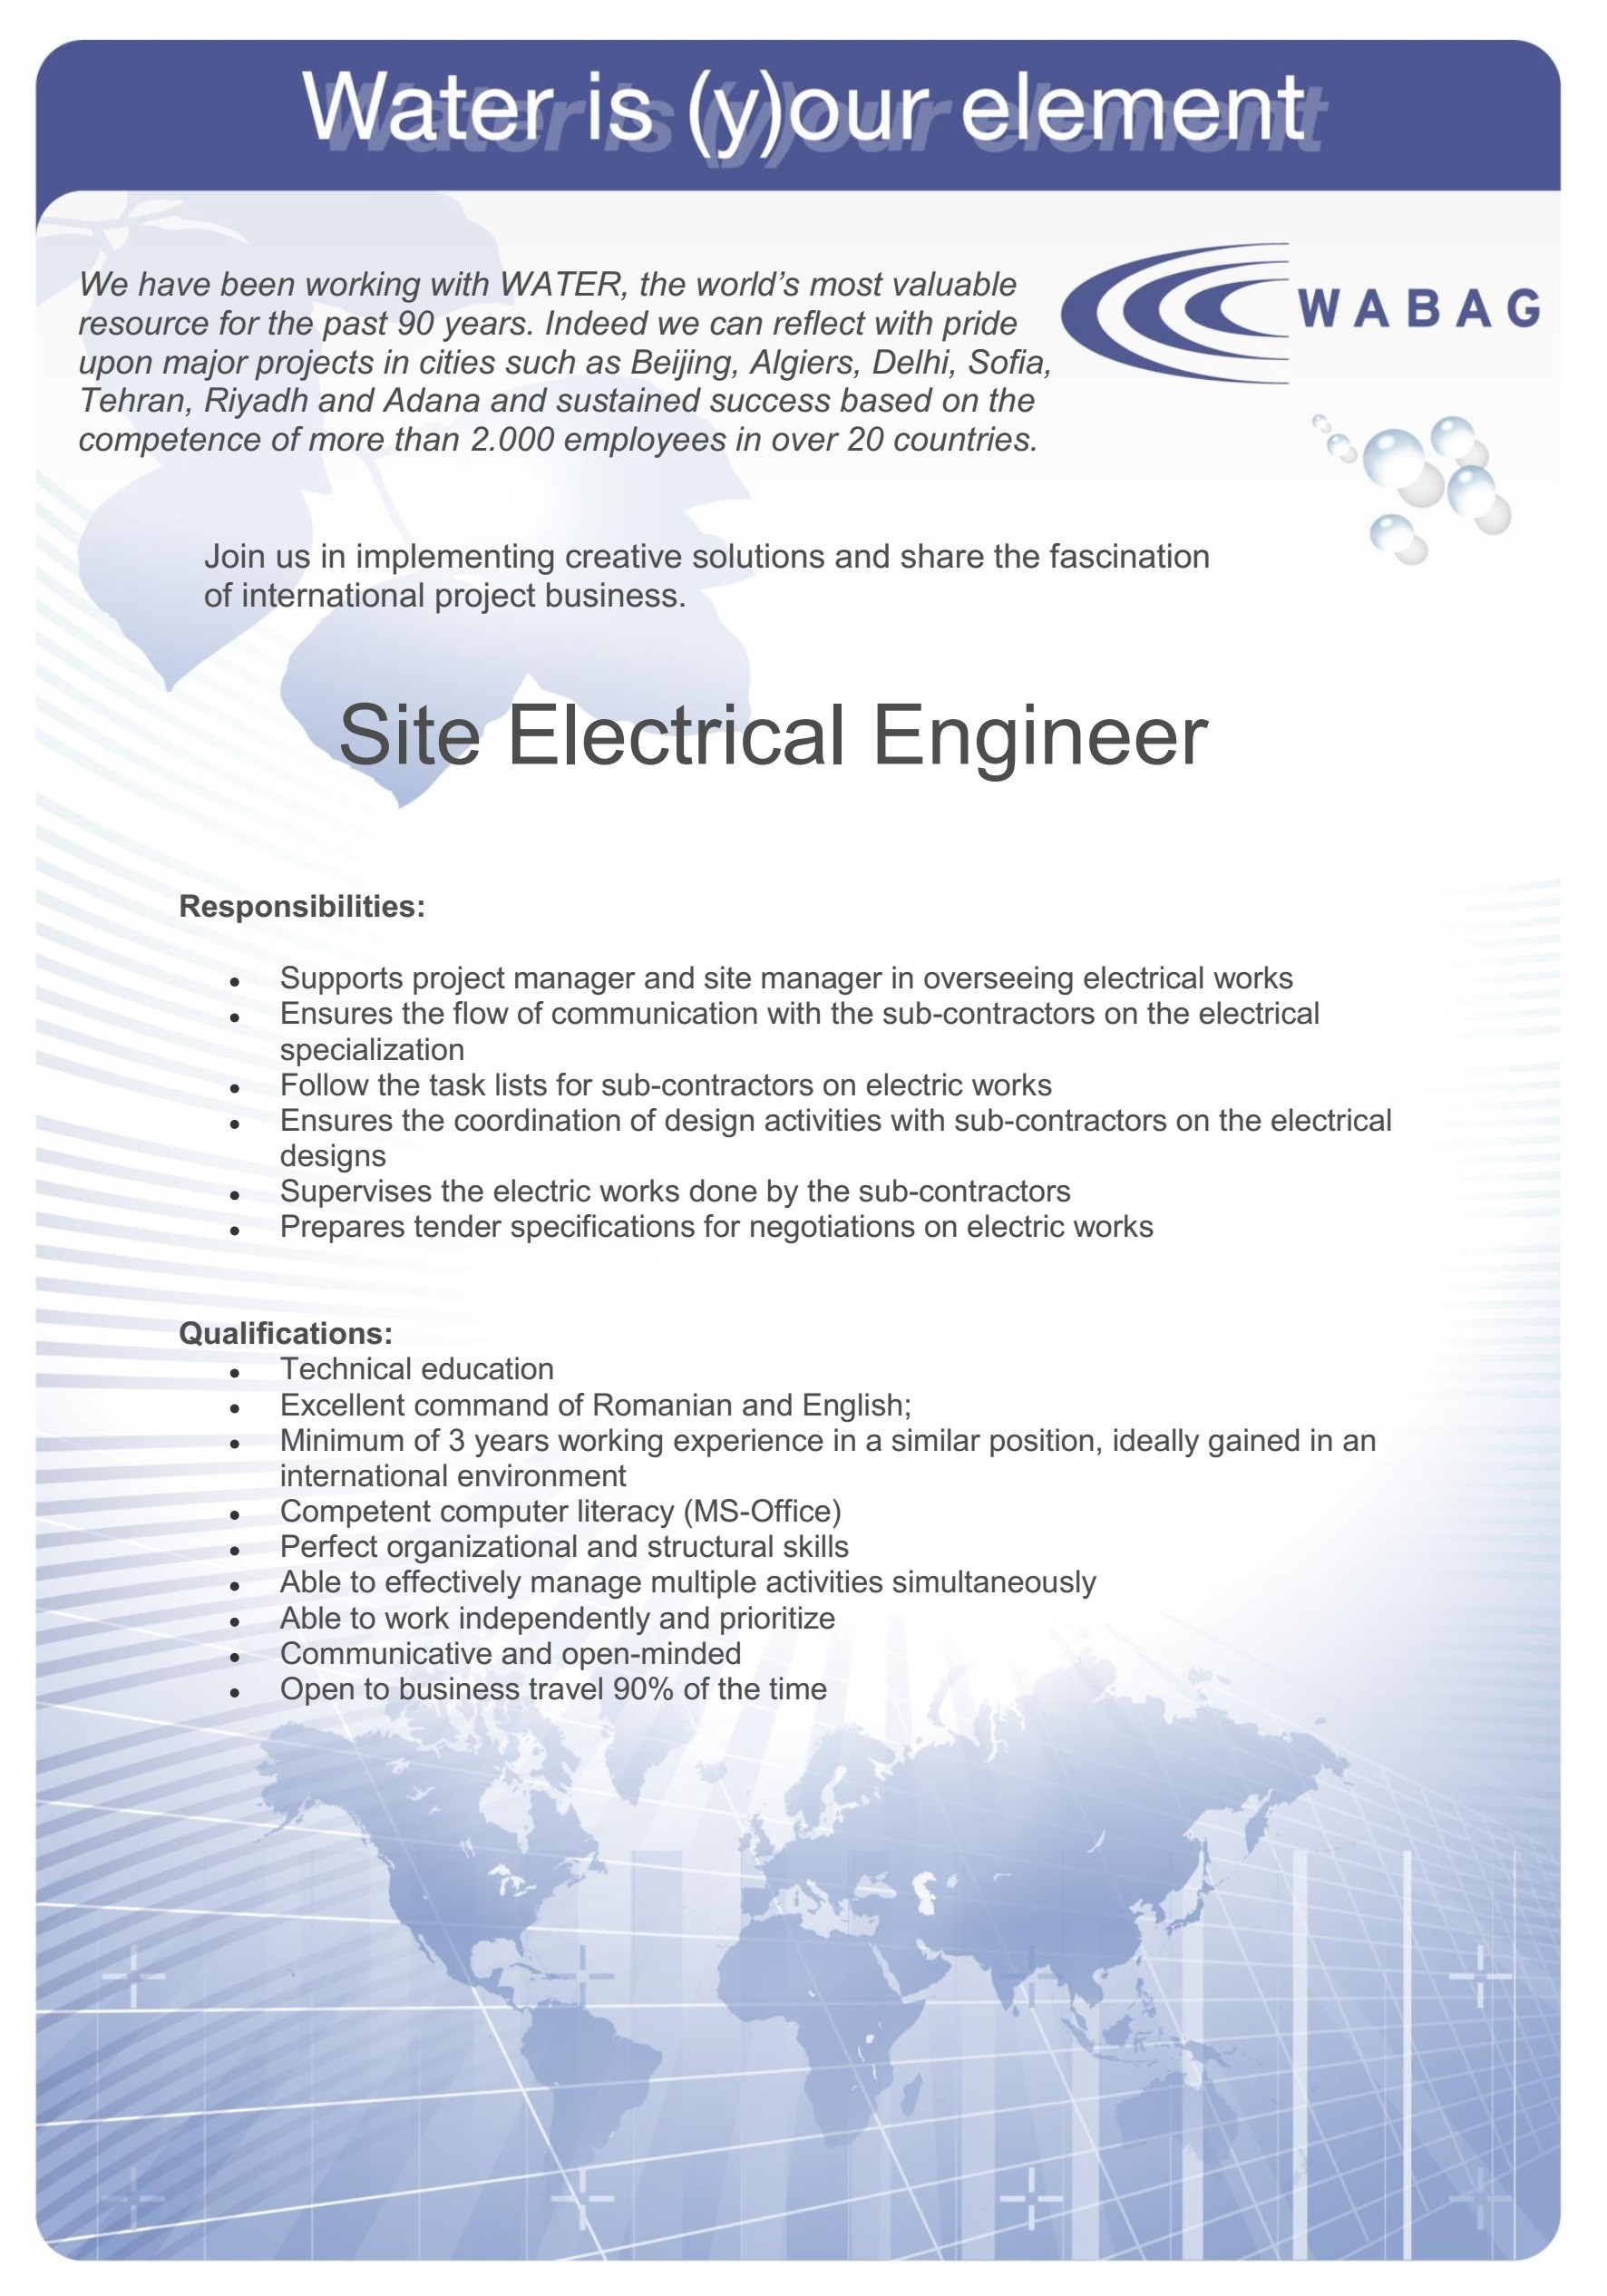 Site Electrical Engineer